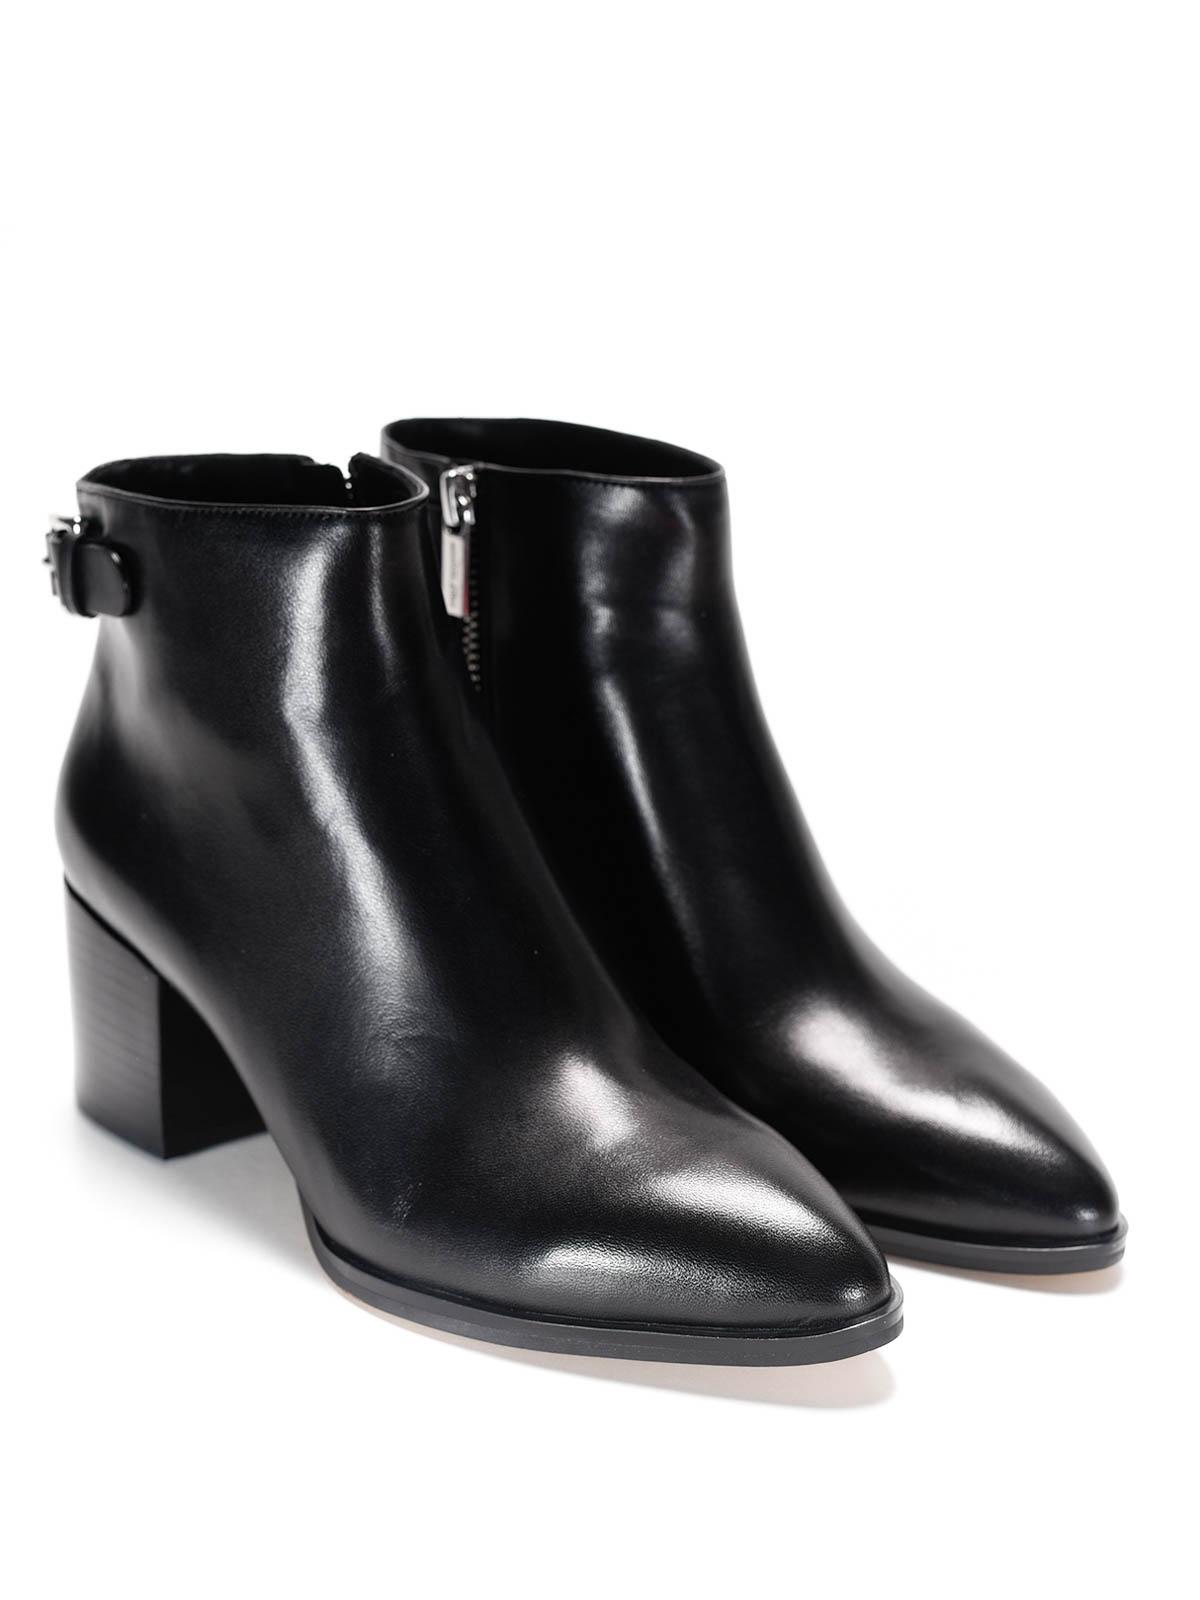 Michael Kors - Saylor leather ankle